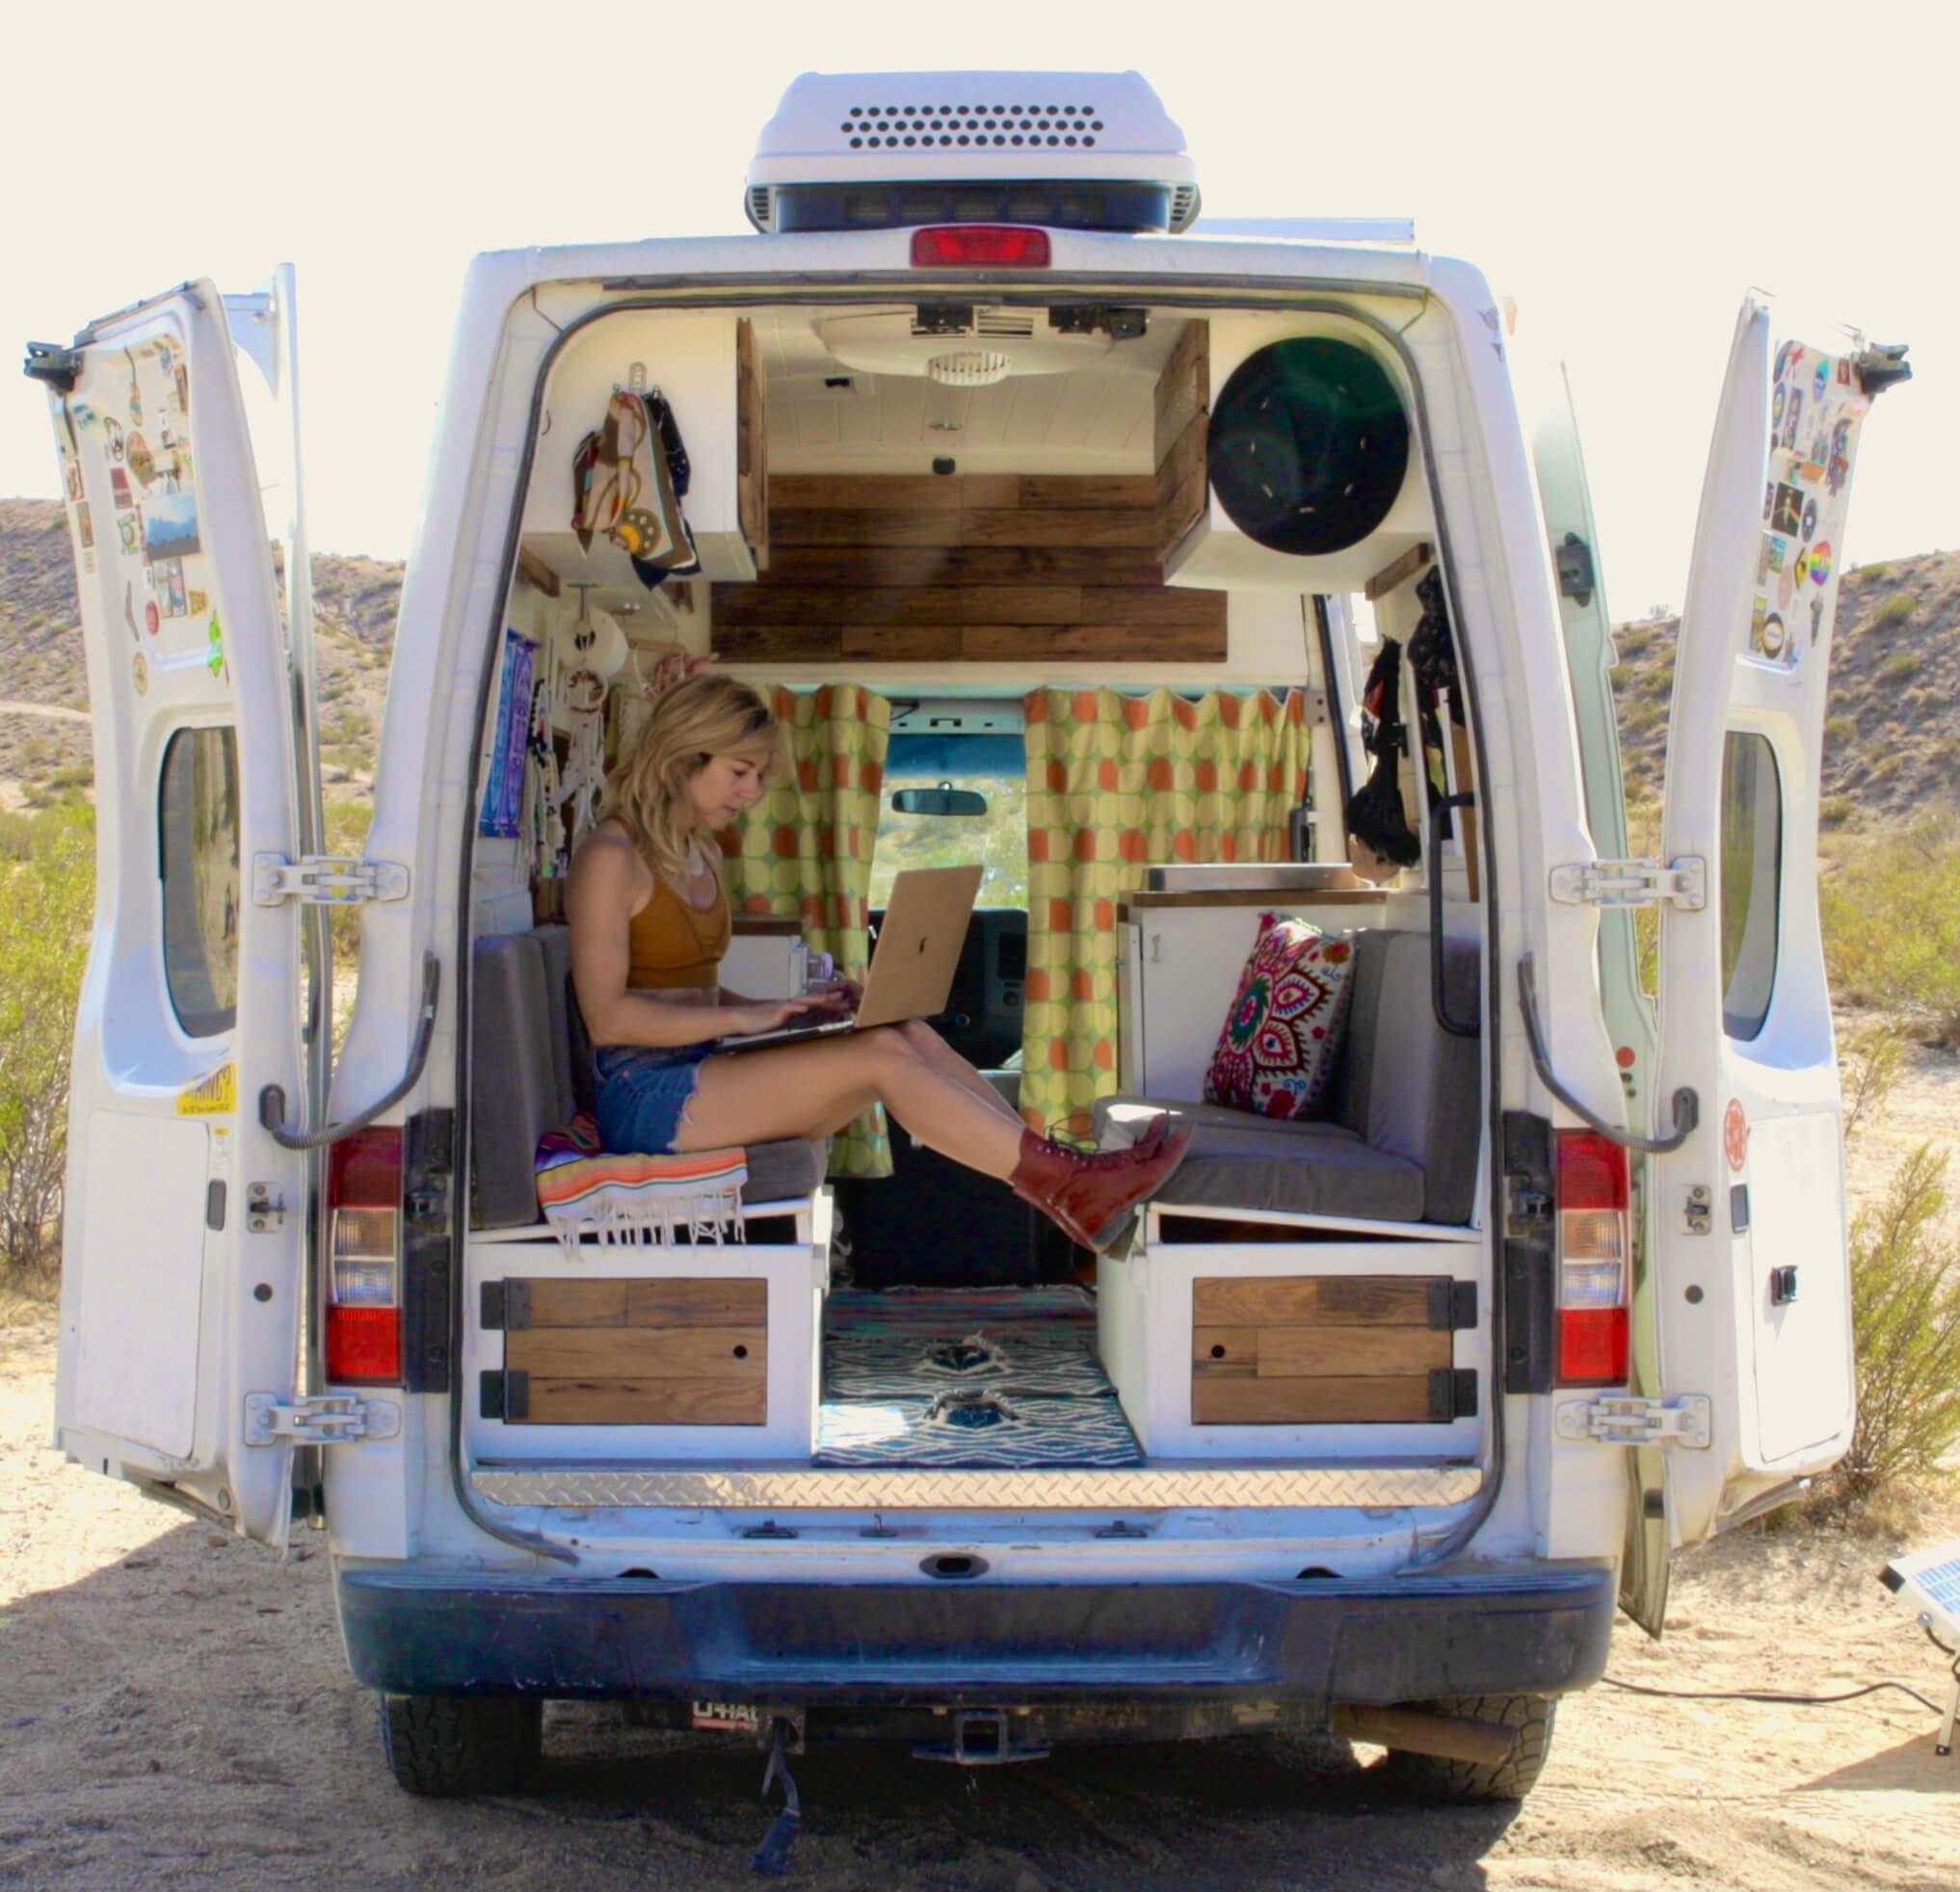 camper van girl working remotely advice digital nomad solo female travel united states